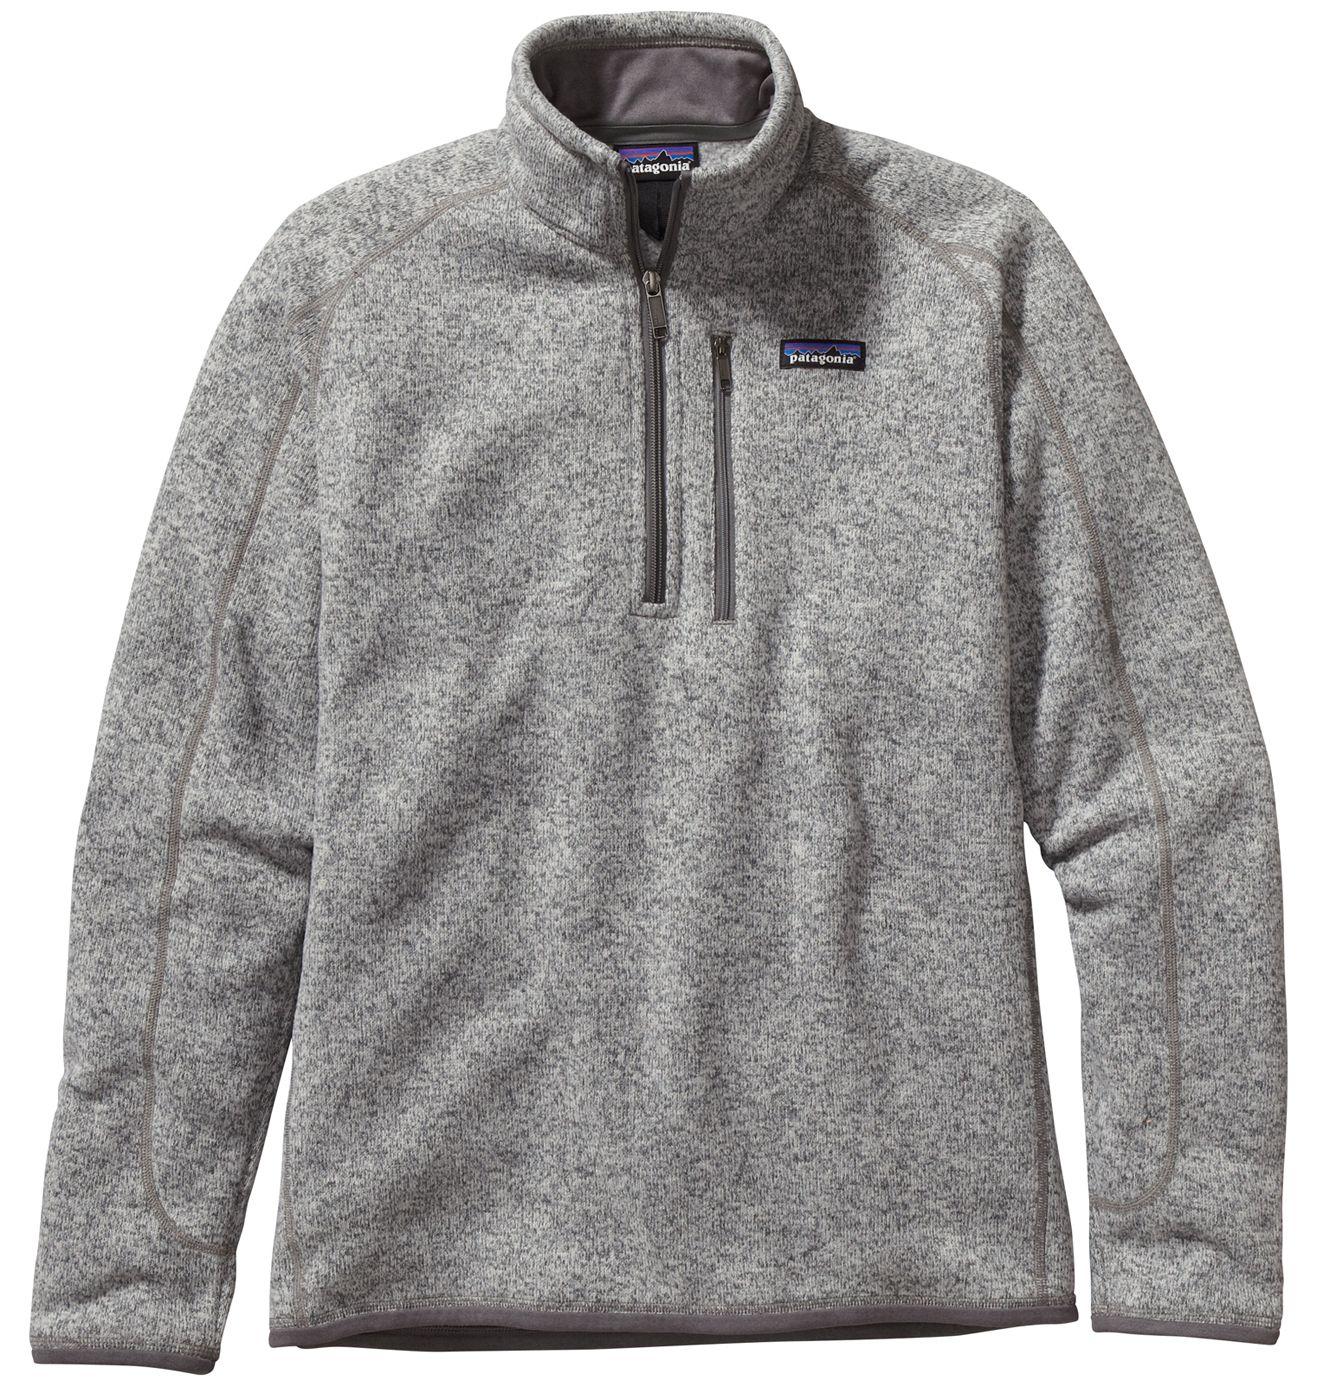 patagonia jackets mens - google search | Menswear | Pinterest